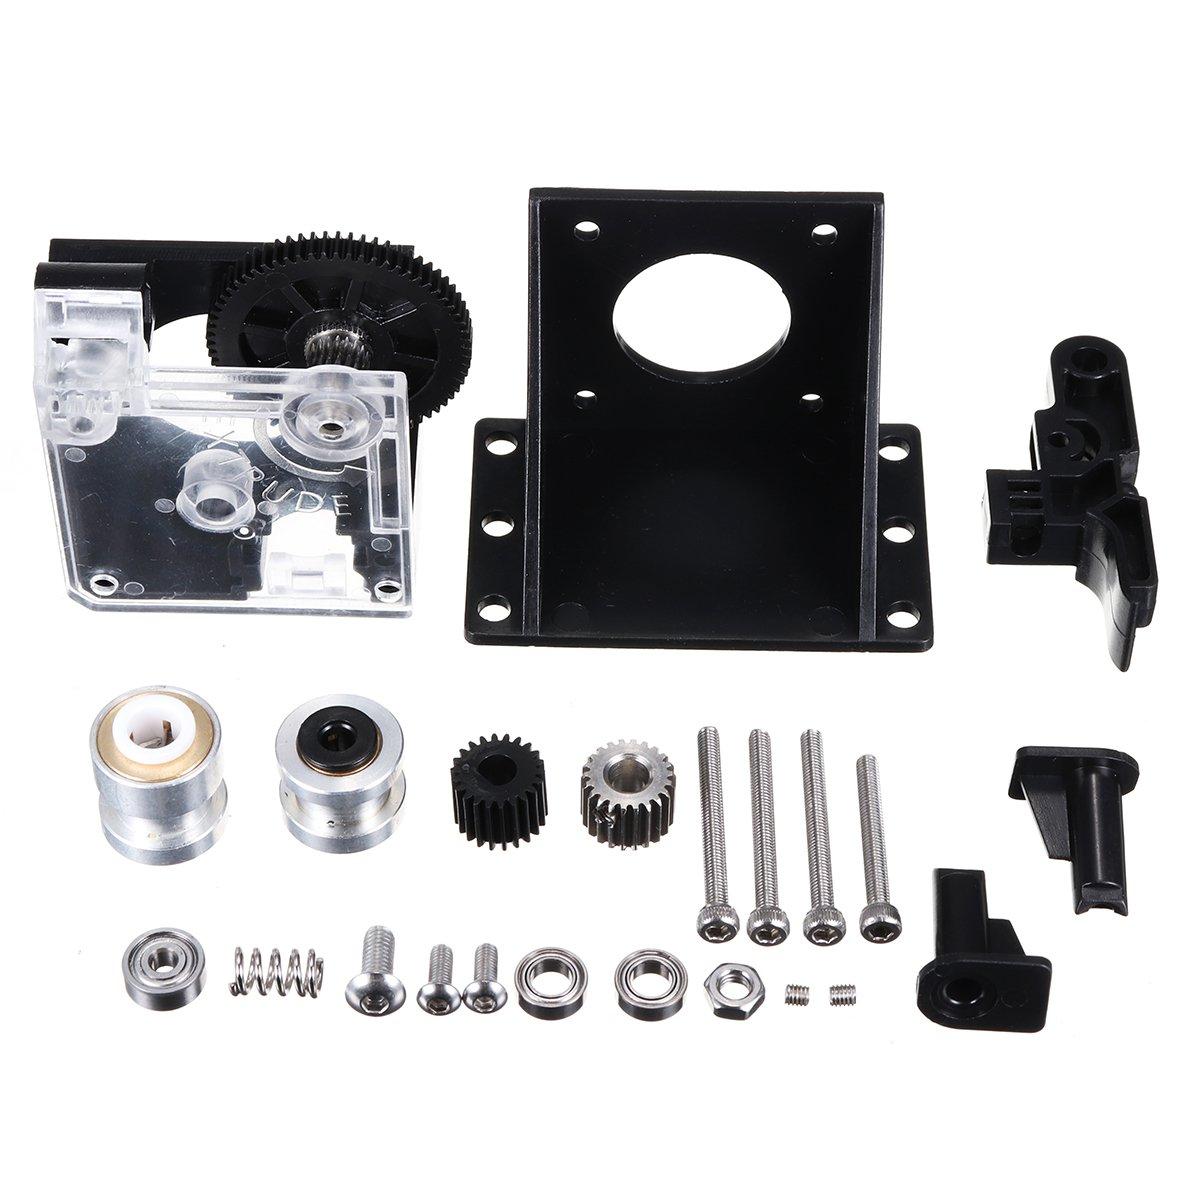 Farwind V5/V6 - Kit de extracción universal de titanio para ...